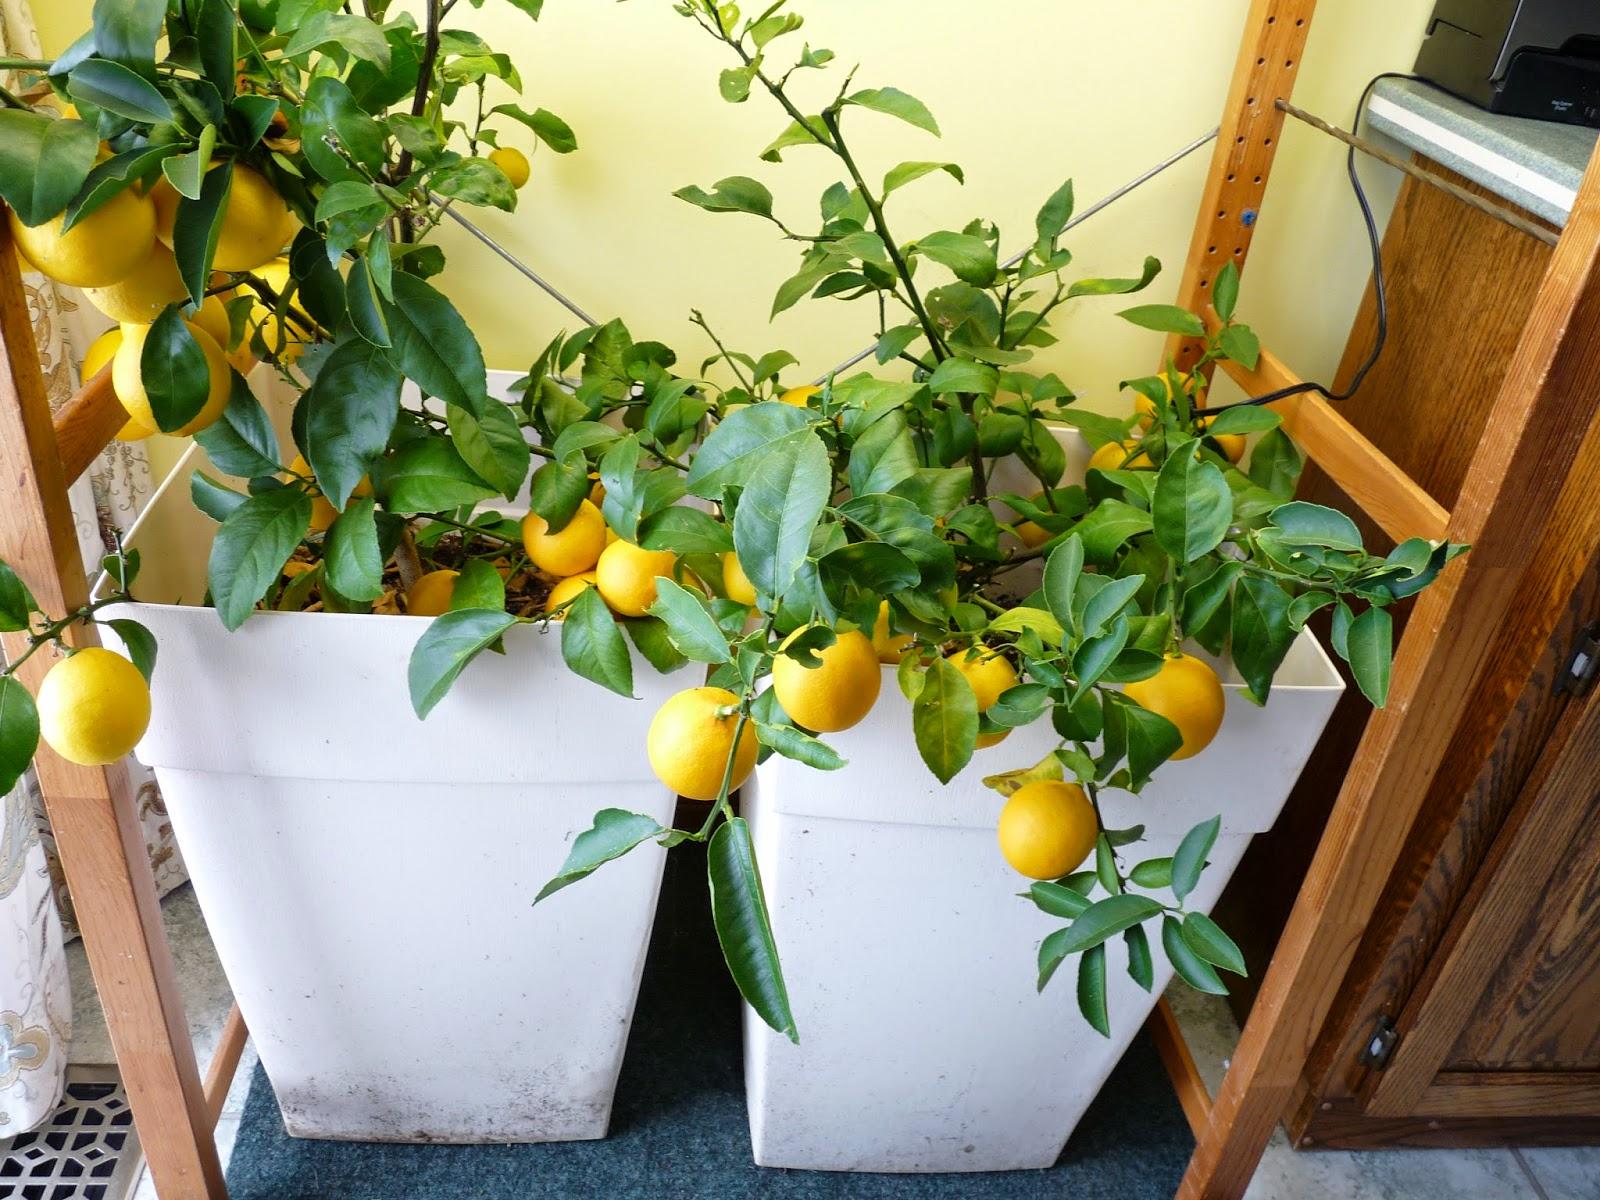 My Meyers lemon trees wintering indoors